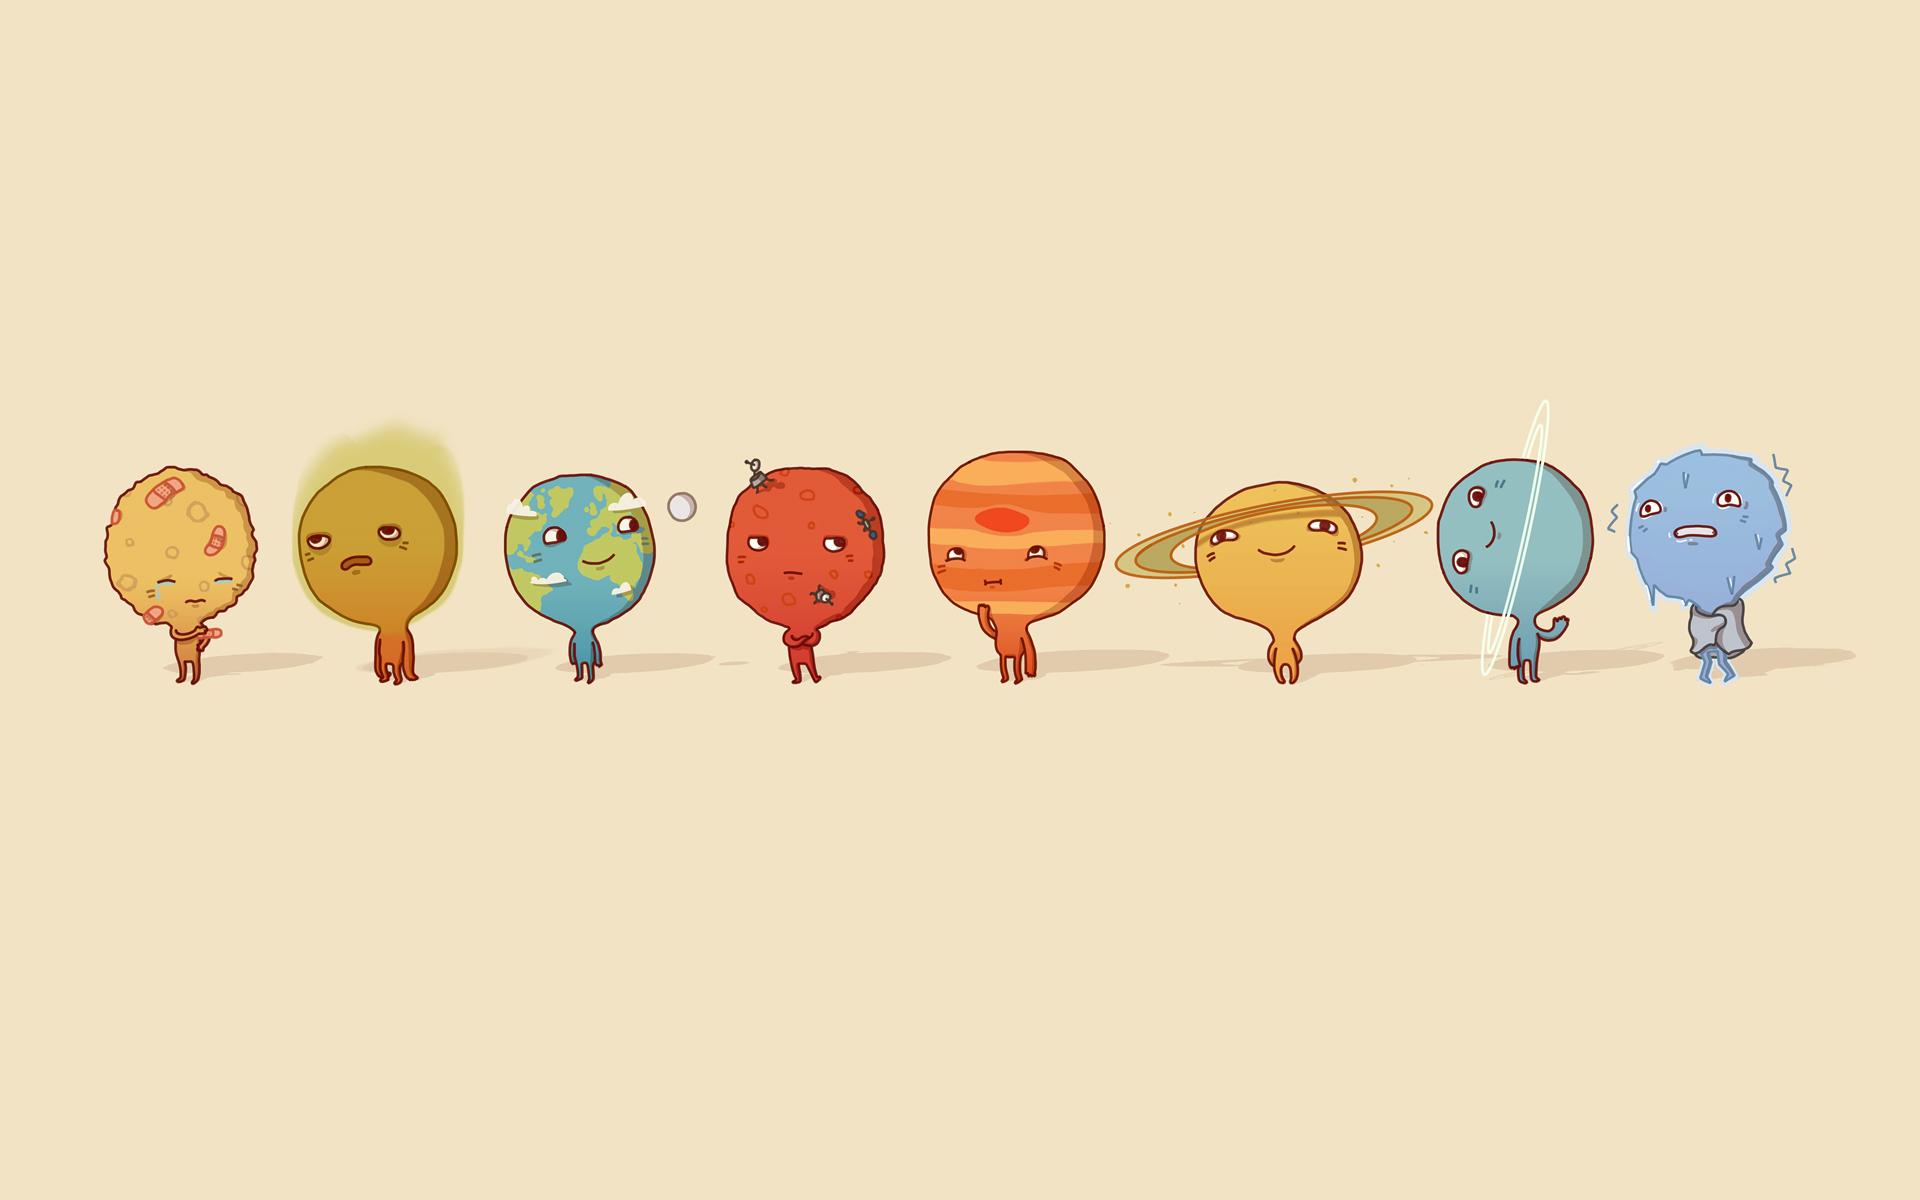 Eight Planets Cartoon 1920x1200 830 HD Wallpaper Res 1920x1200 1920x1200